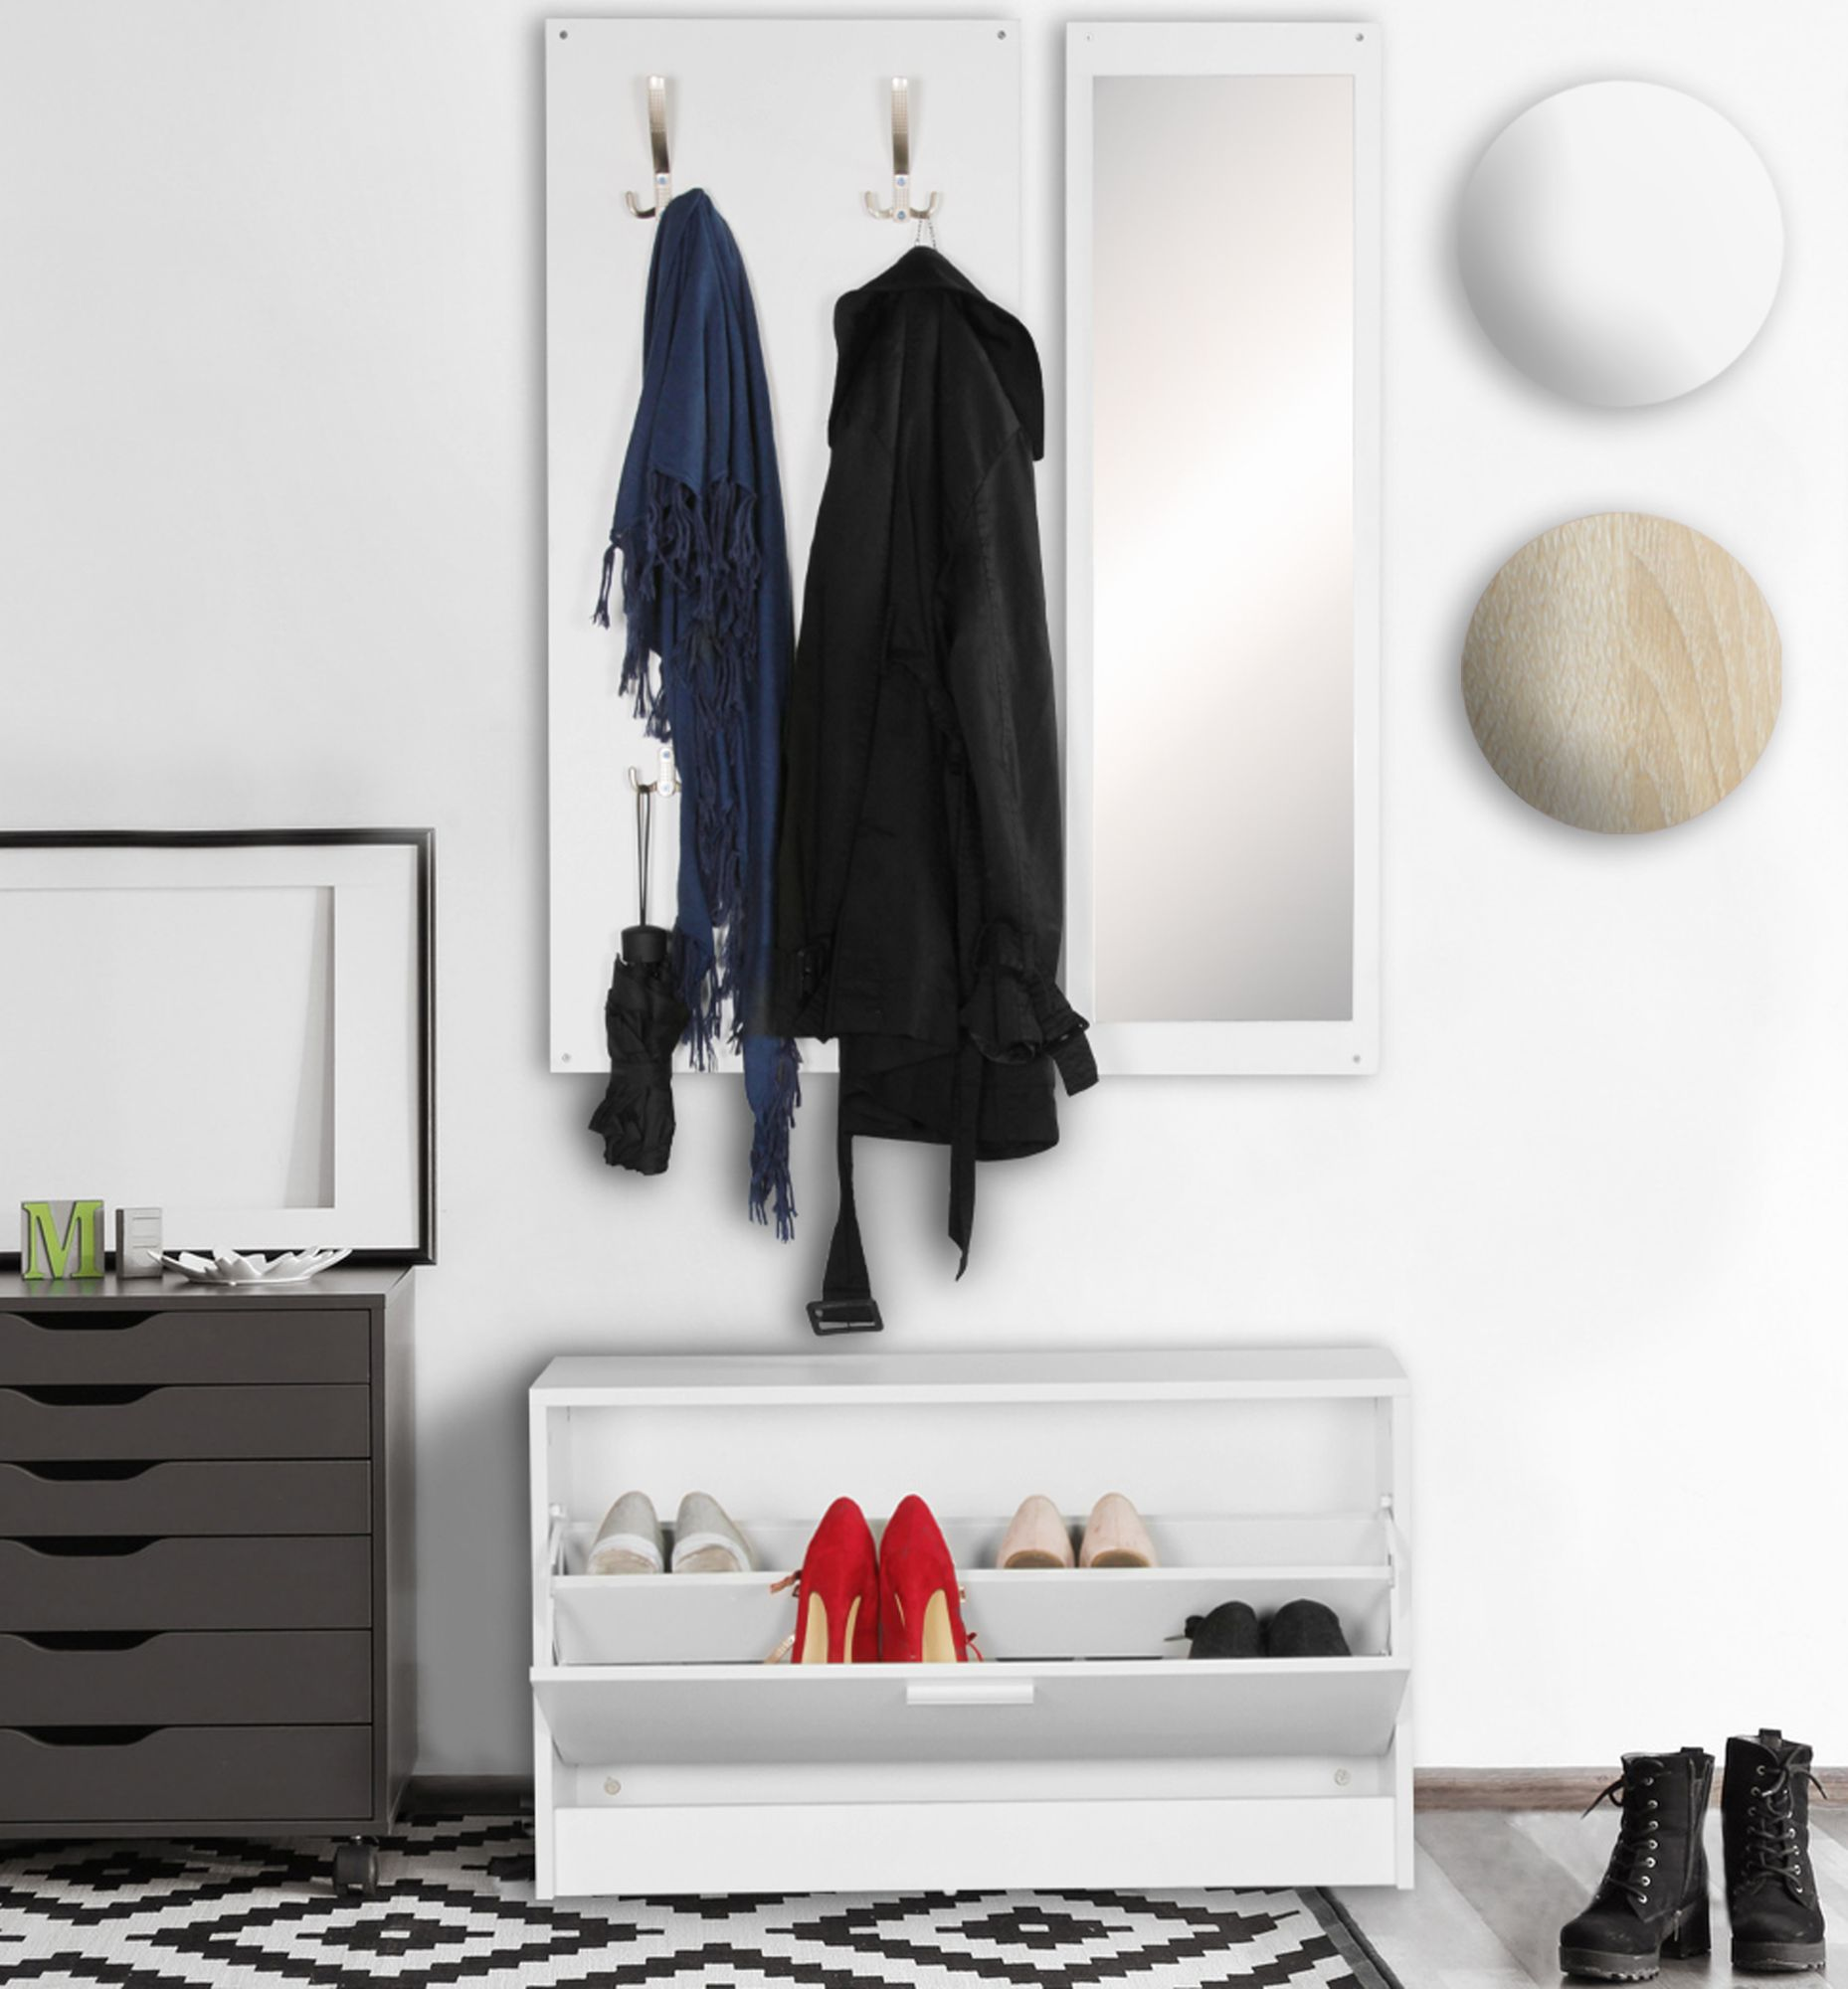 Garderobe Flurgarderobe Paneel Wandgarderobe Spiegel Komplett Set Kompakt Flur